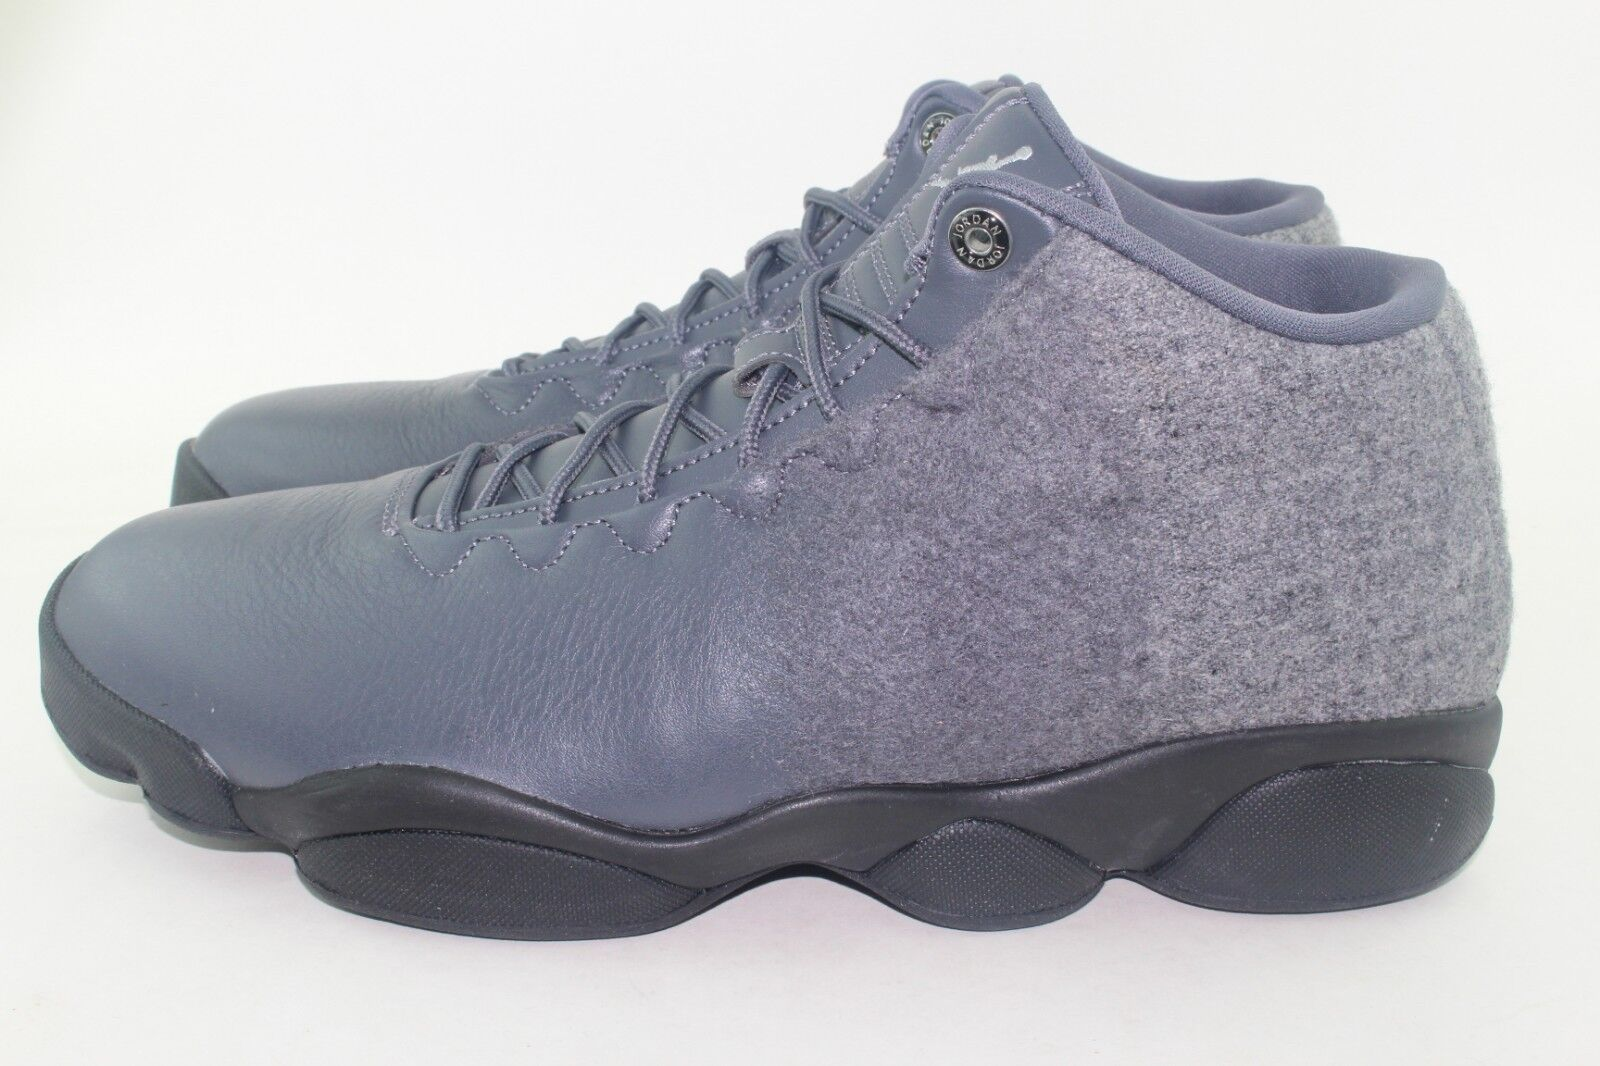 Horizonte de Baja Premium Jordan Plata Hombre Gris Plata Jordan Nuevos Cómodos Raro a36fed